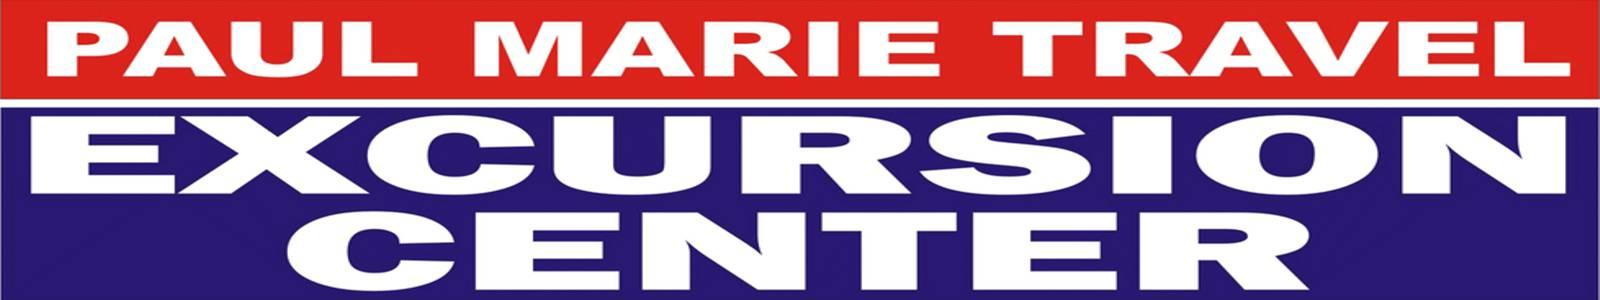 PAULMARIETRAVEL2018 1600x300 - PAUL MARIE TRAVEL EXCURSION CENTER